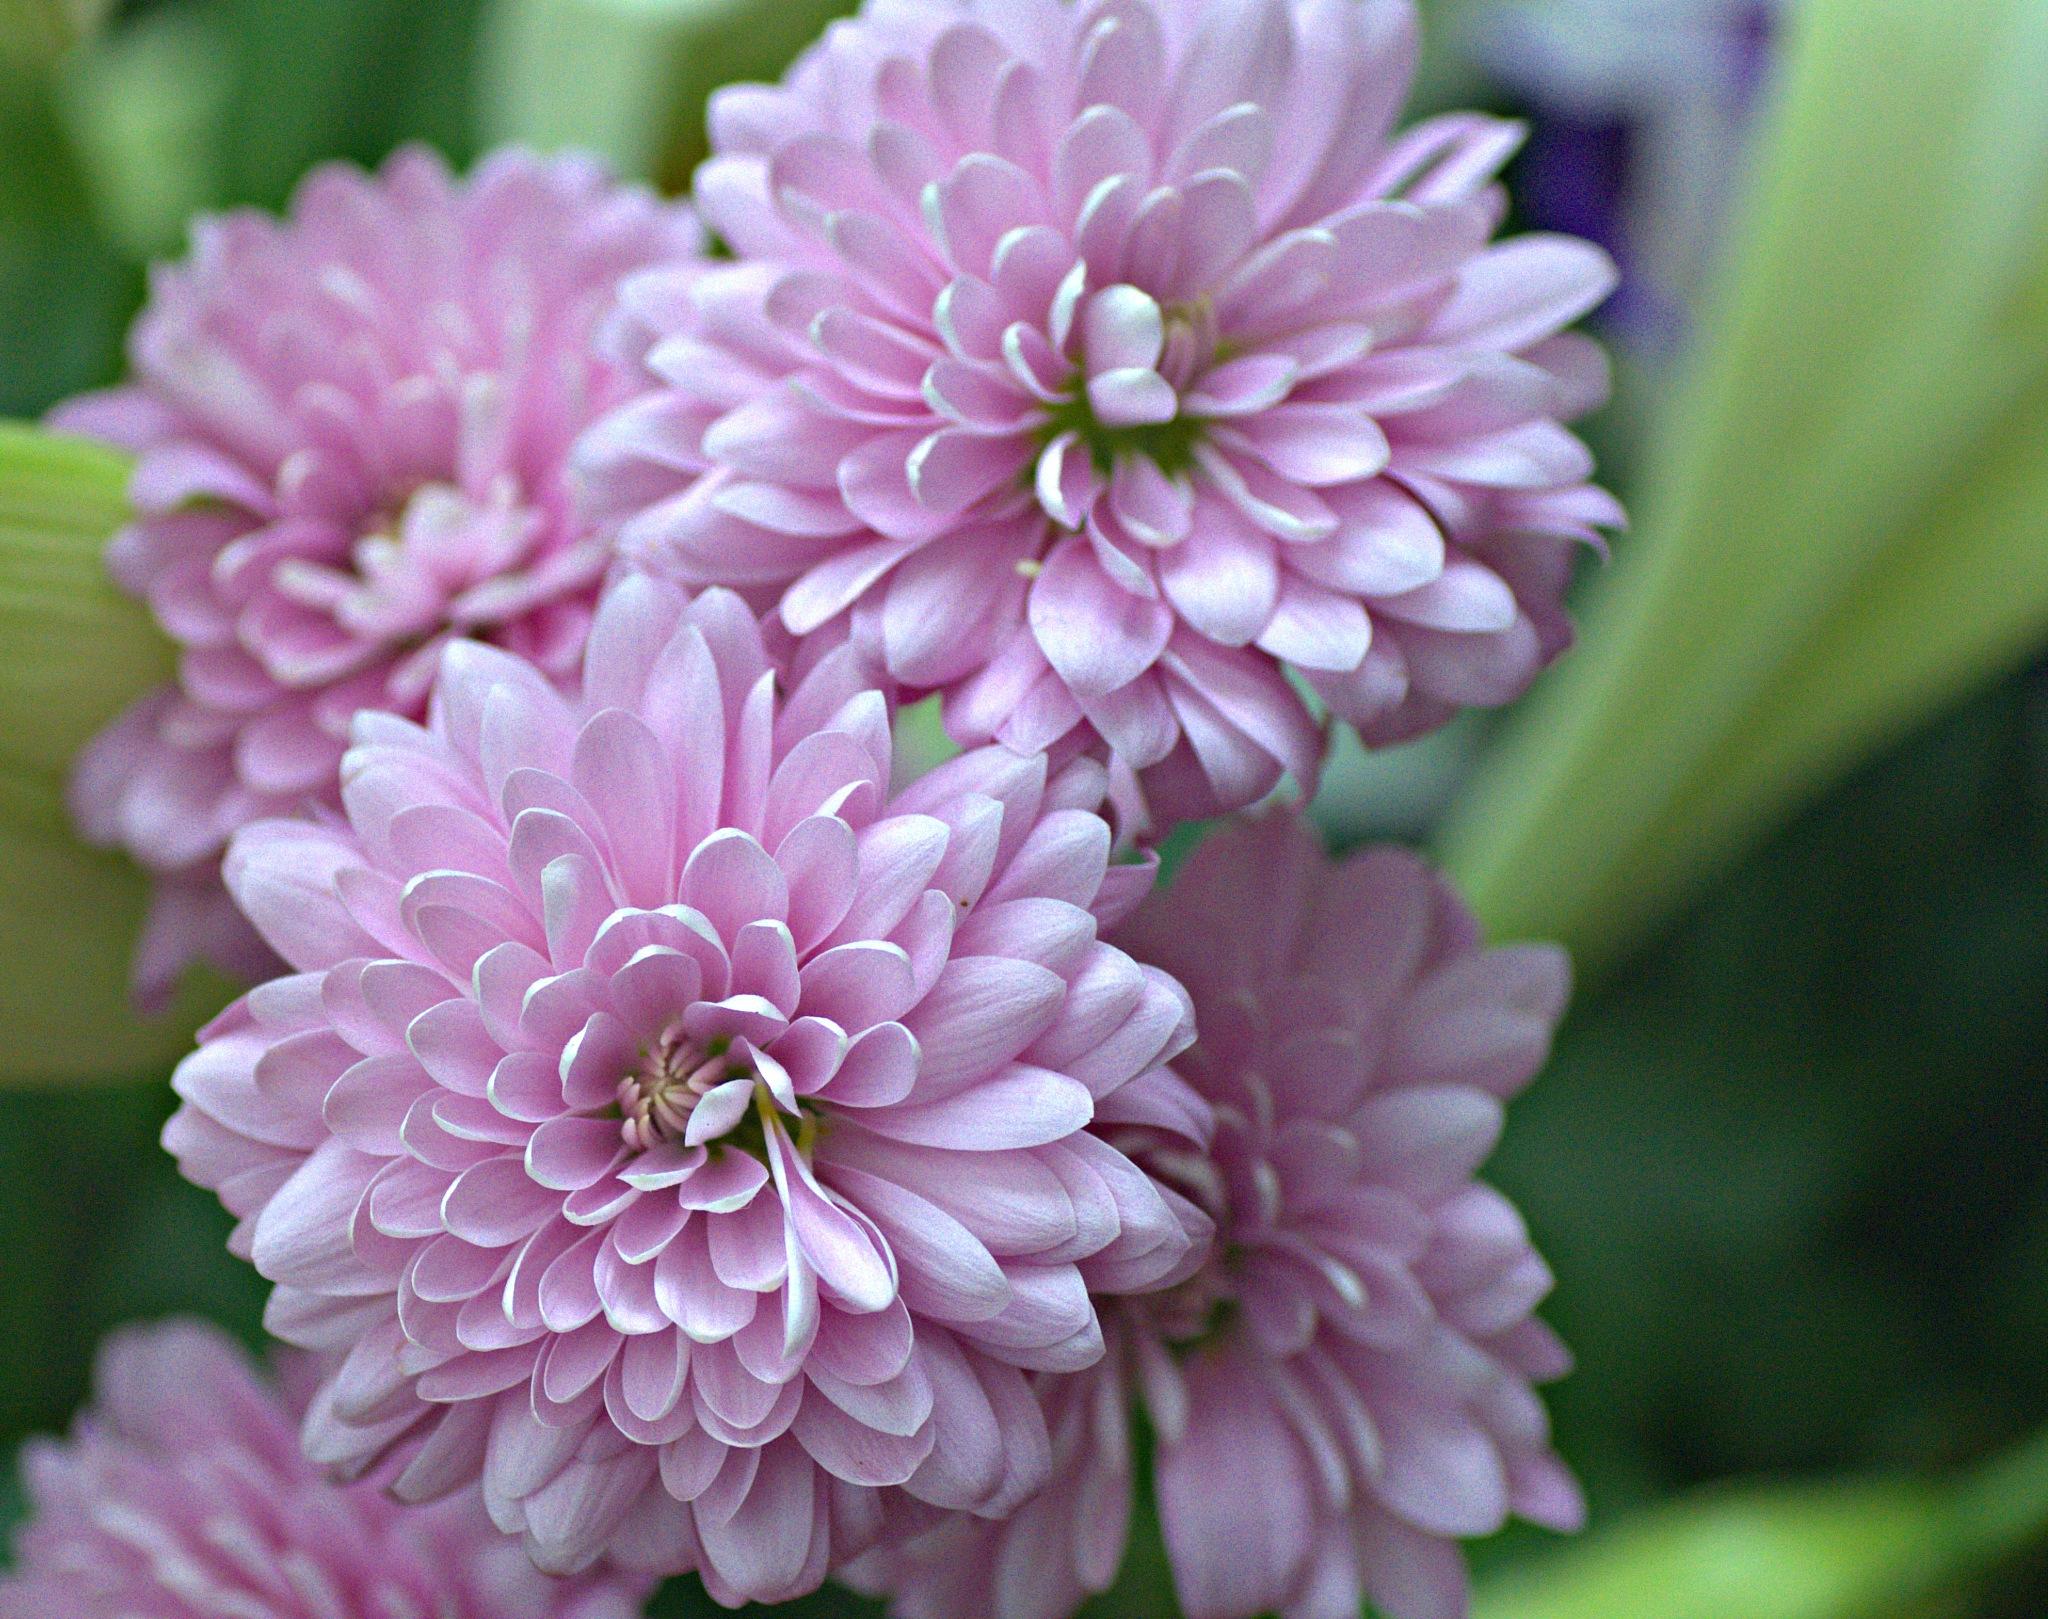 flowers 3 by EdwardStern